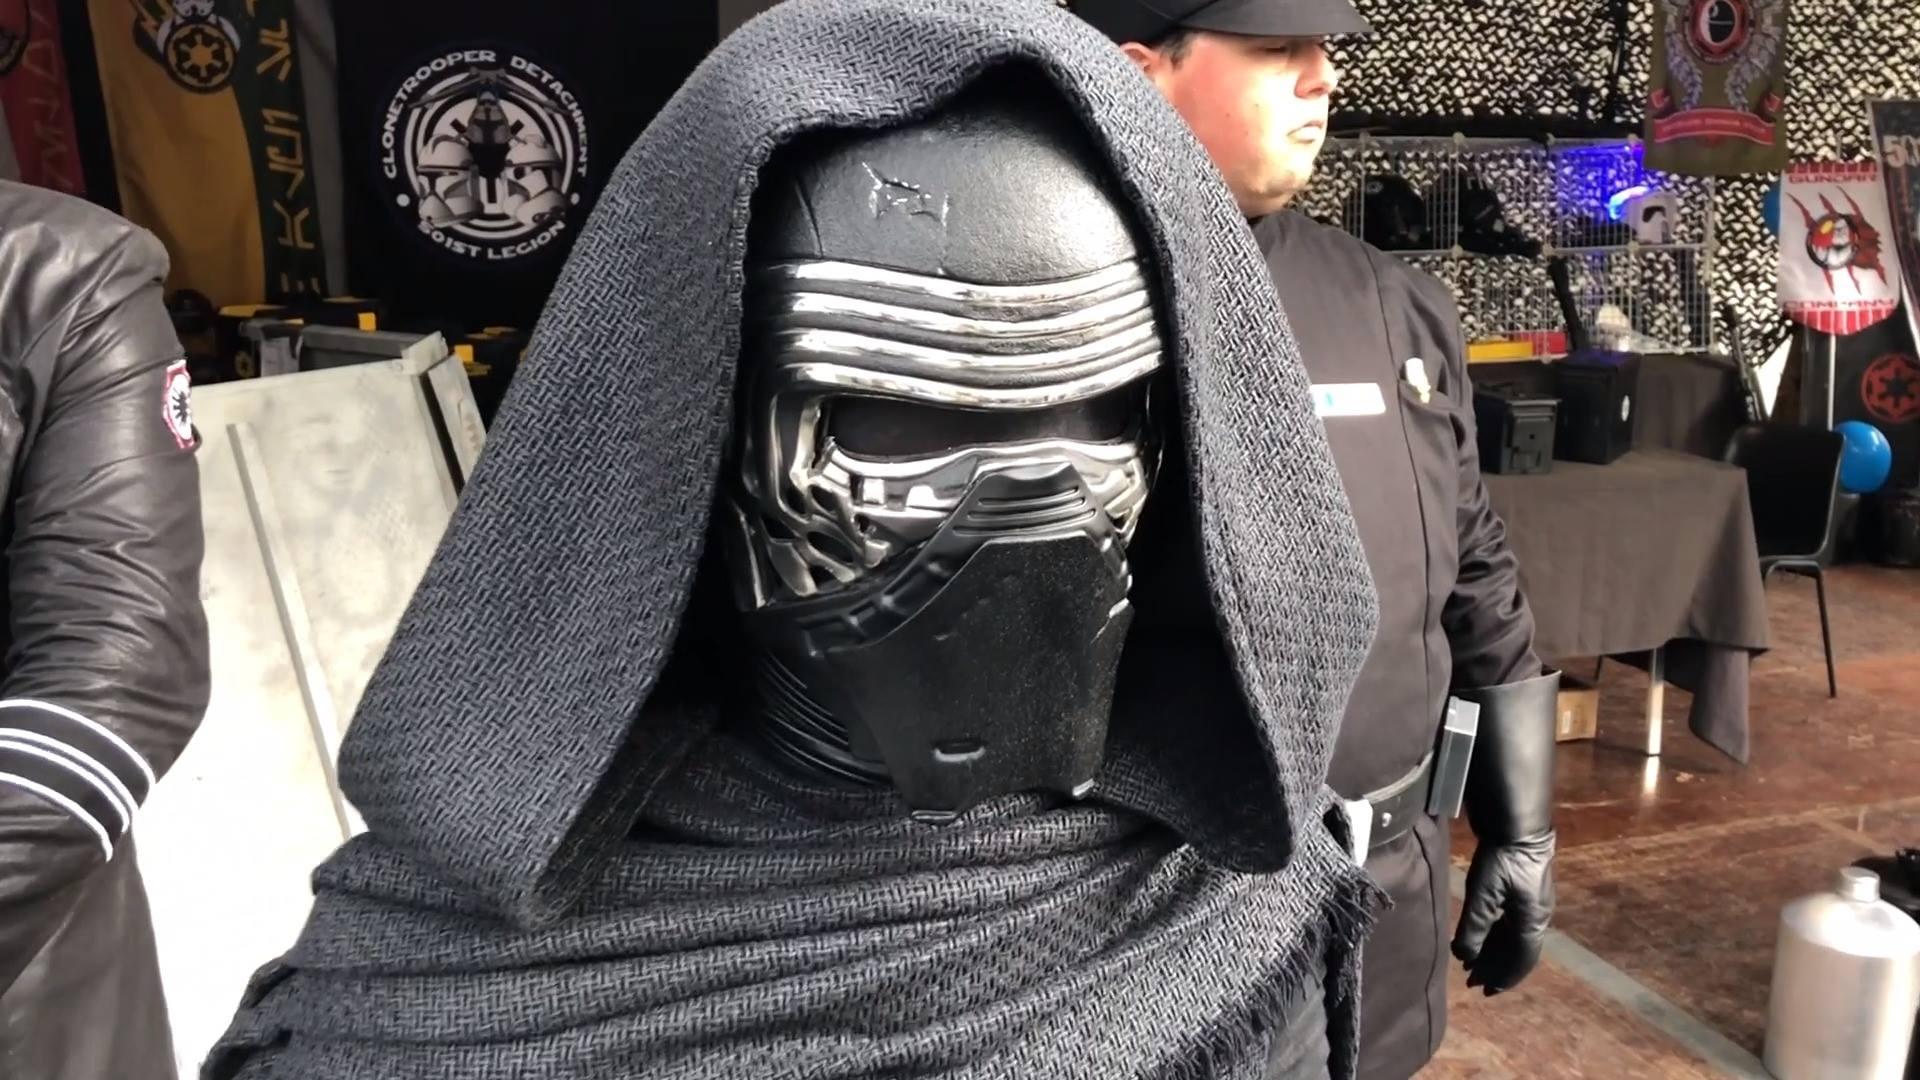 il fandom di Star Wars a Lucca Comics & Games 2018